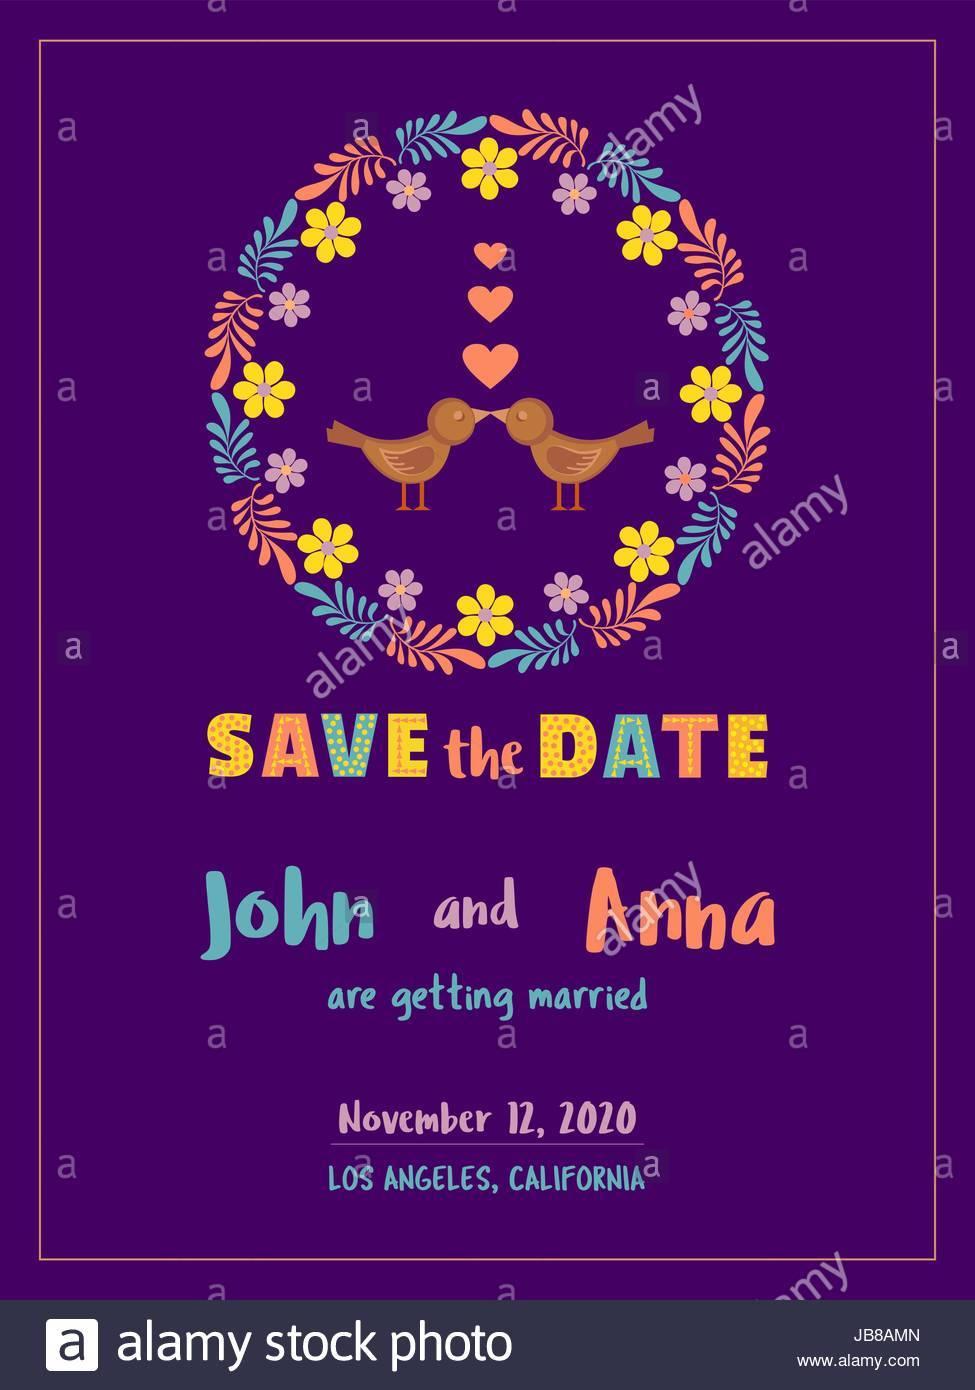 Wedding Date Announcement Template